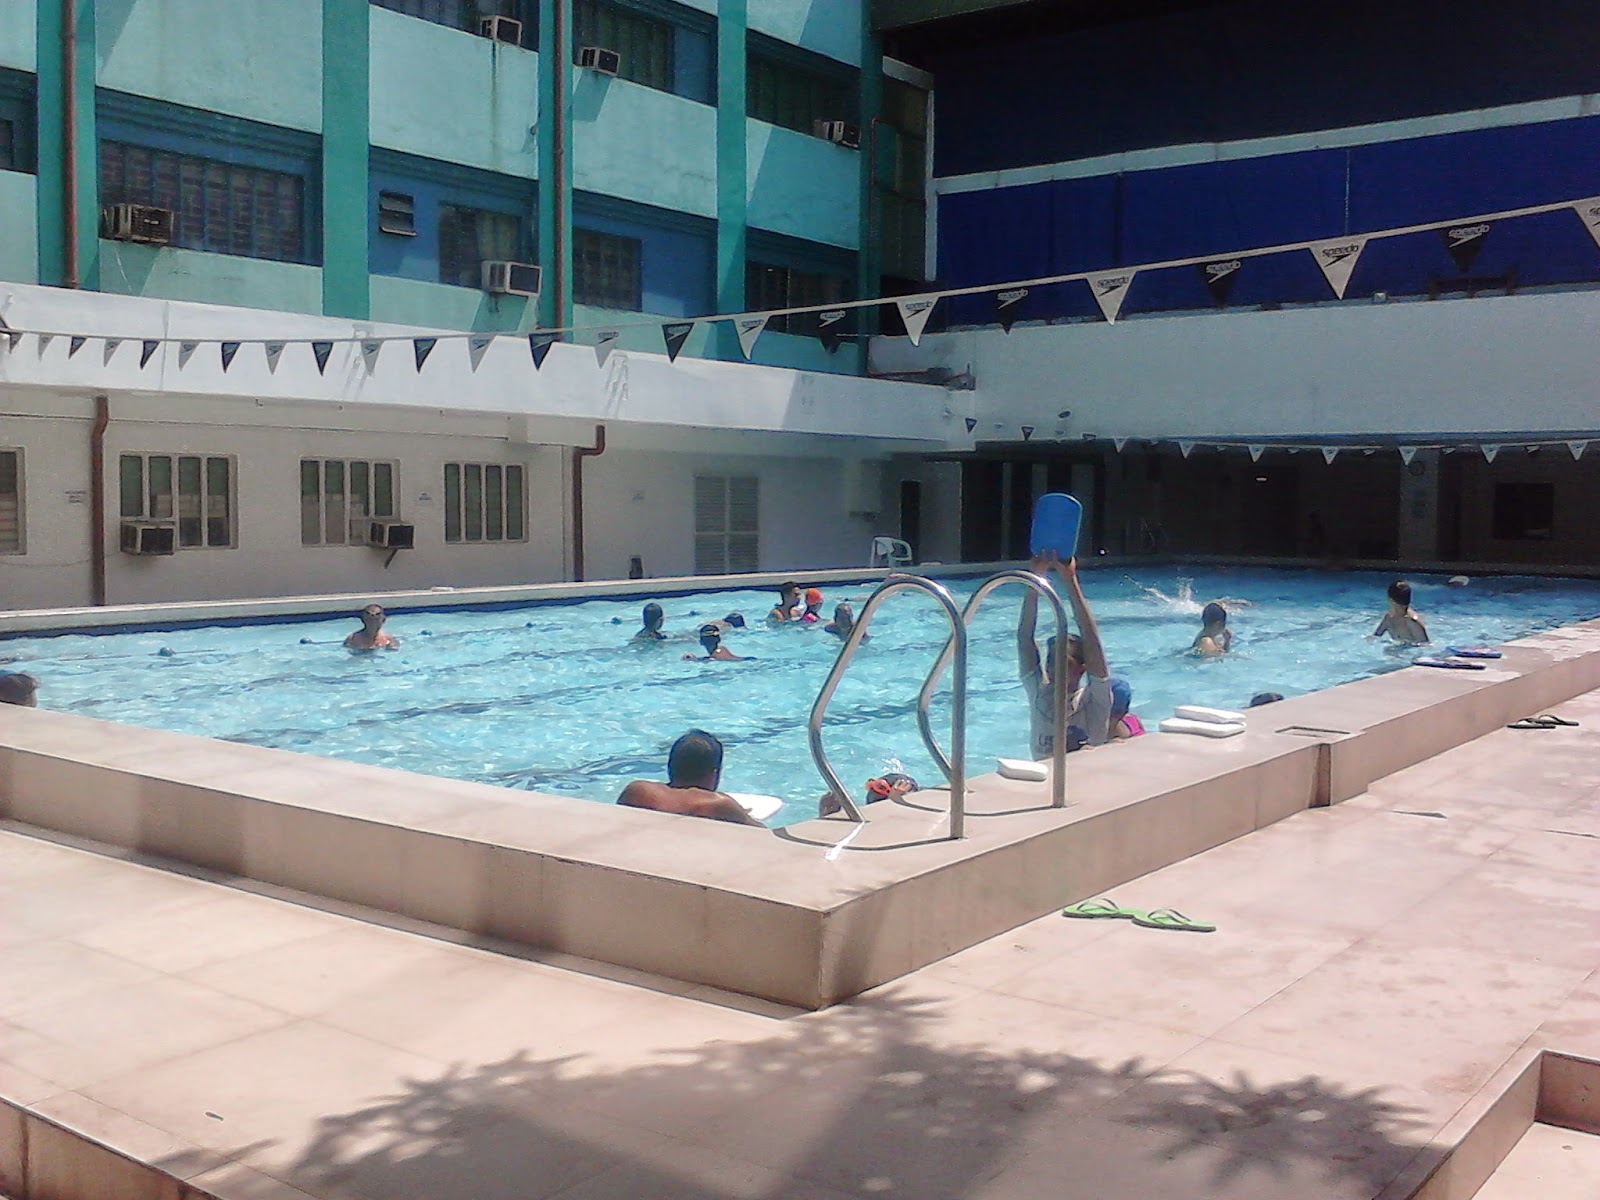 New Ymca Swimming Pool